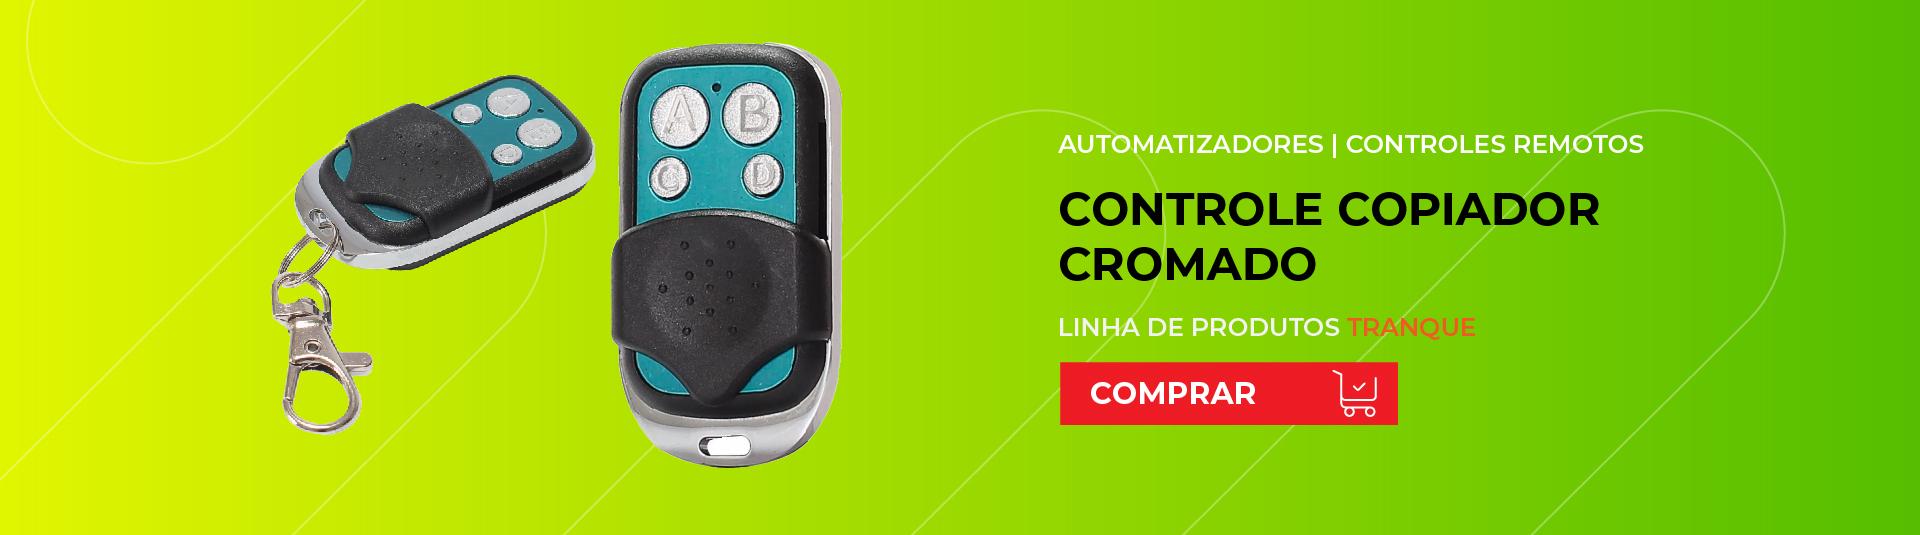 Full Controle Copiador